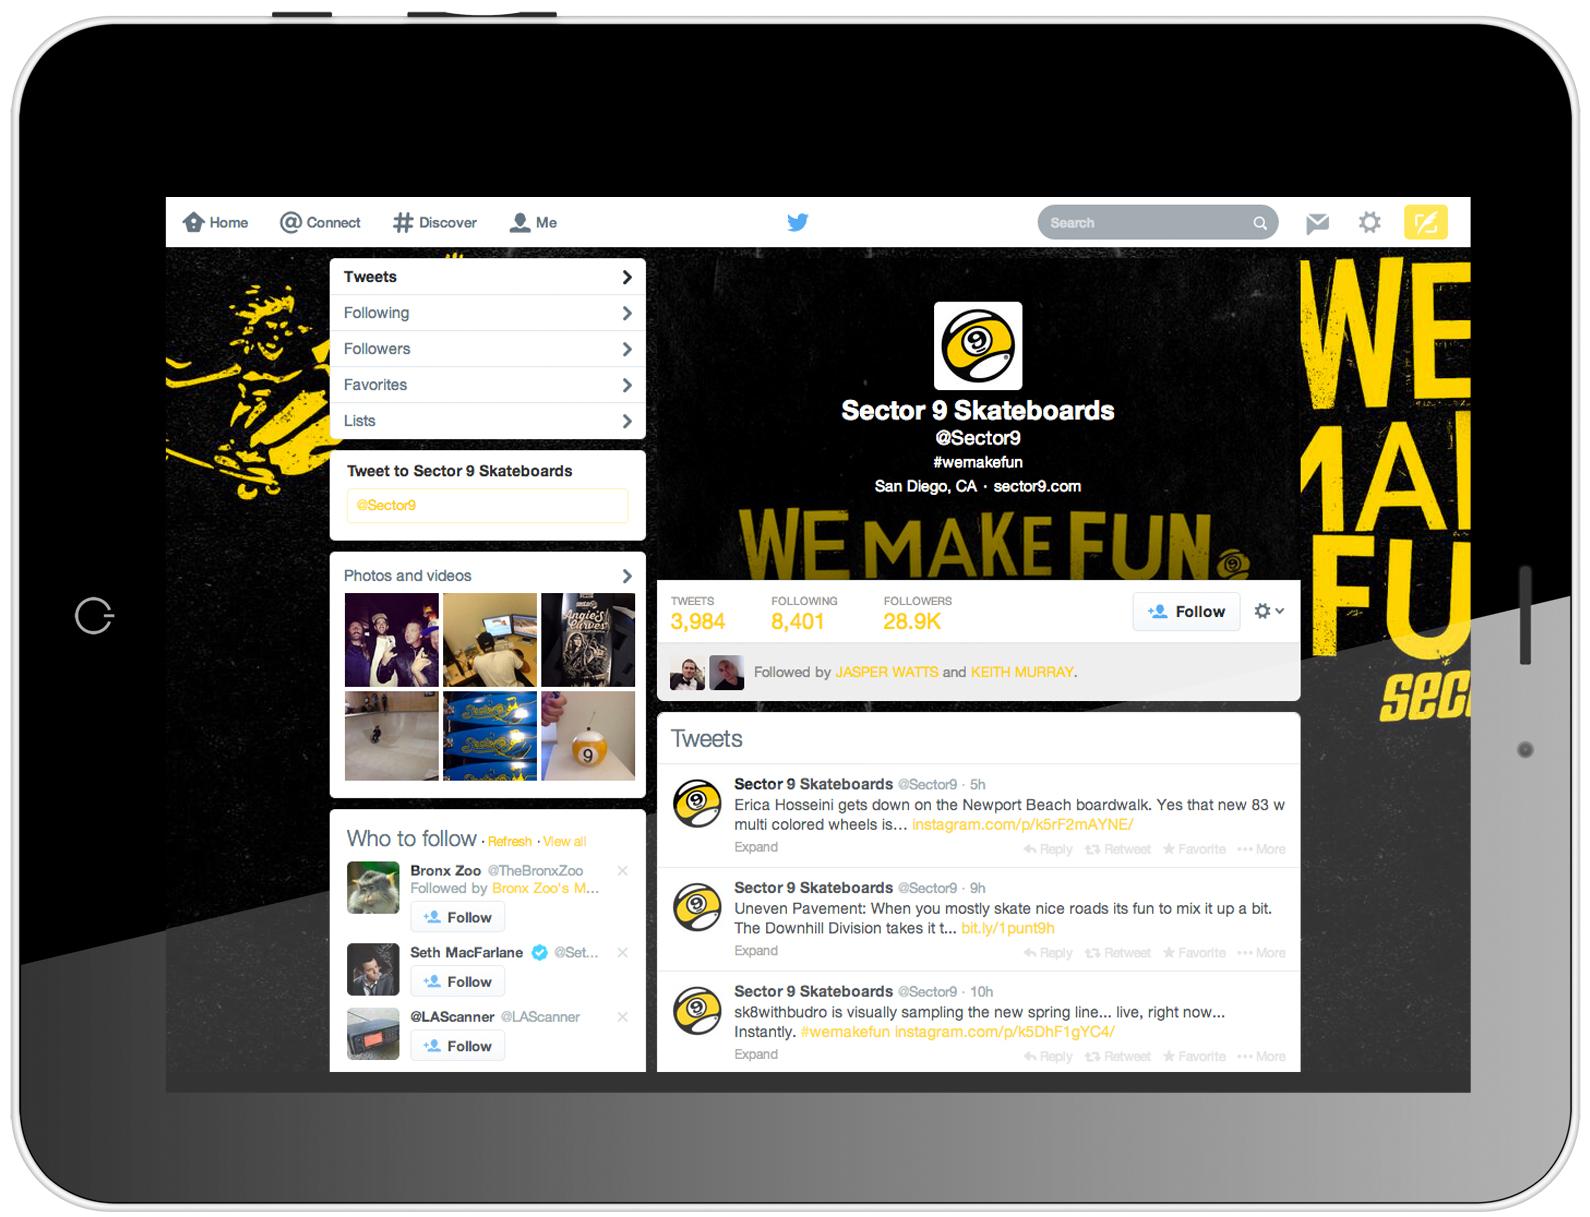 S9_WMF_Twitter.jpg